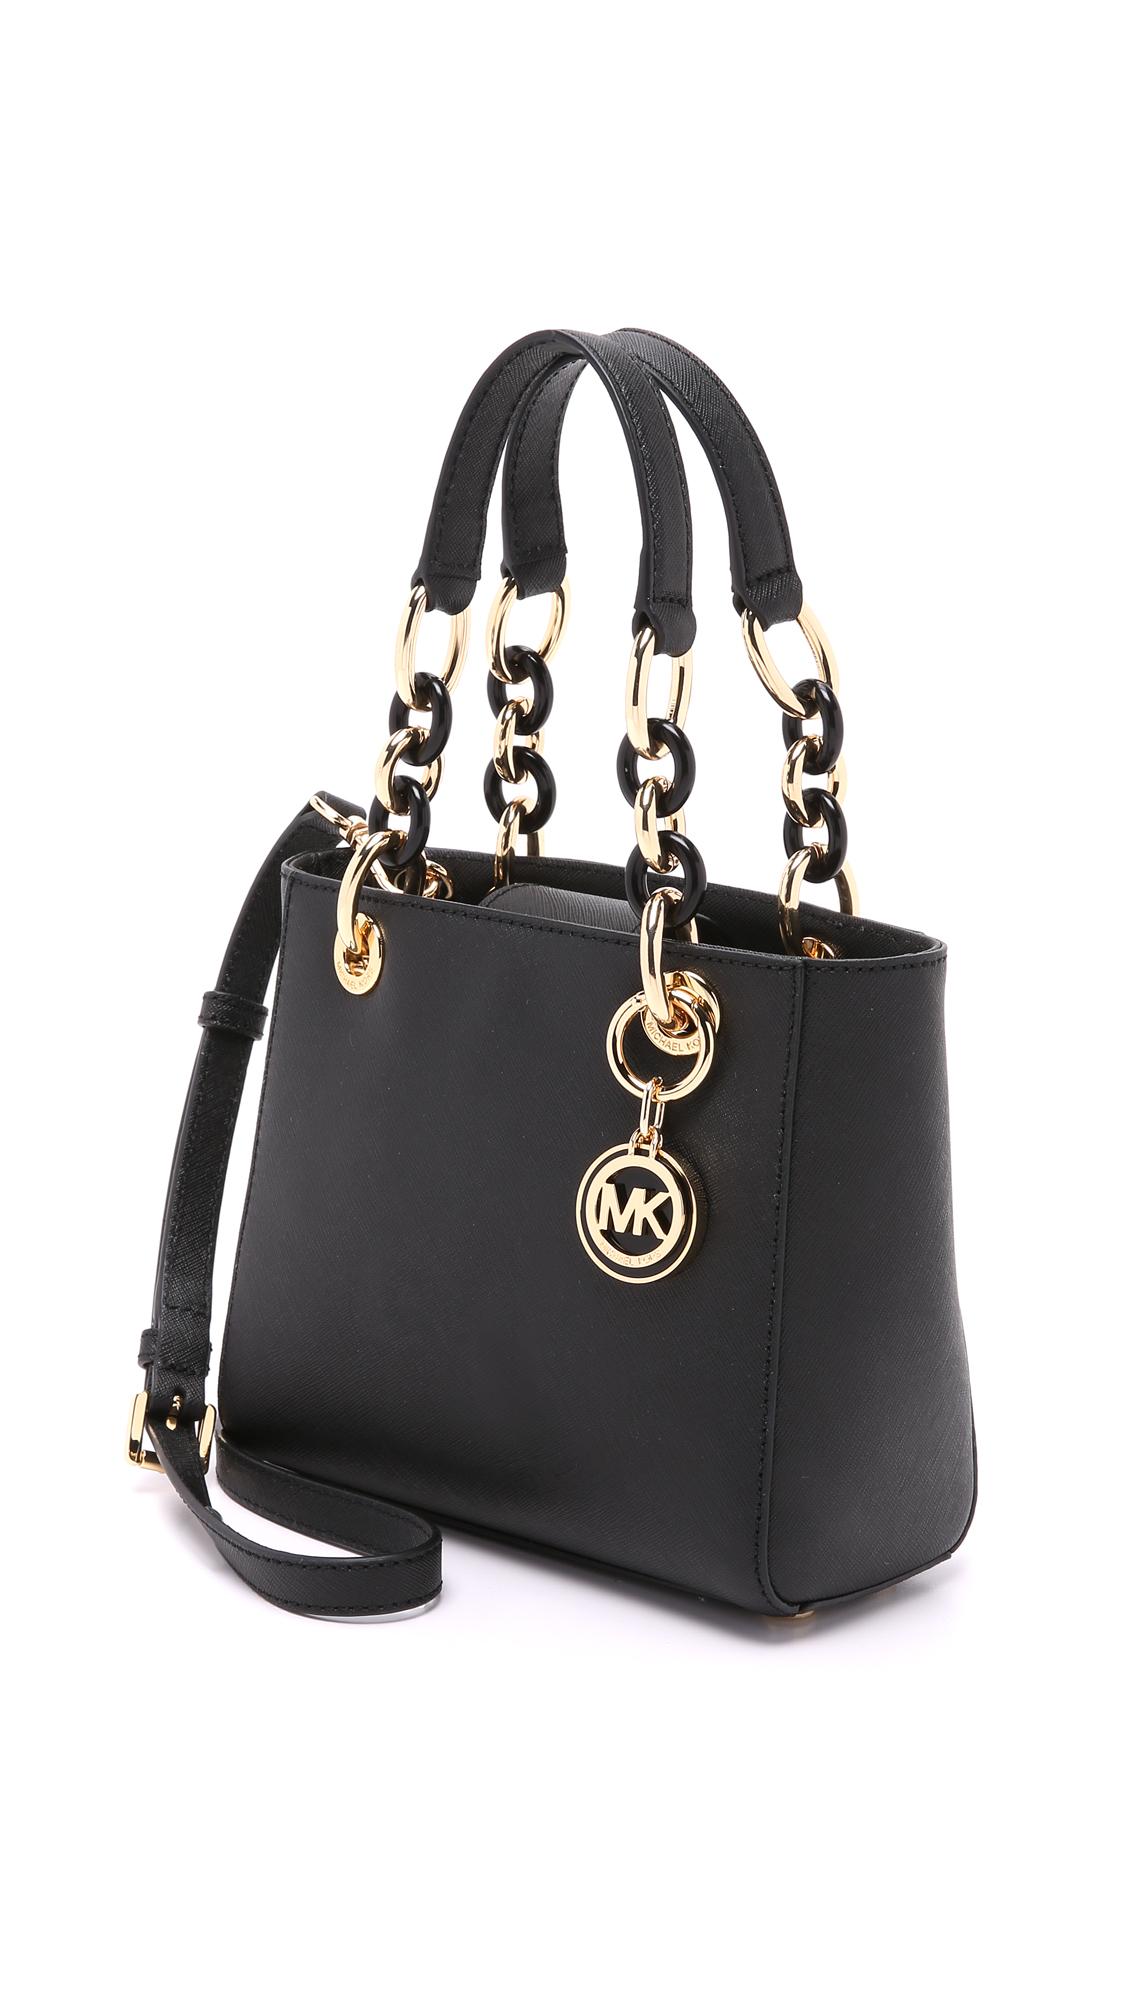 87f0ea84de54 ... where to buy lyst michael michael kors cynthia extra small satchel  black in black 6dc2e 5bb4e ...